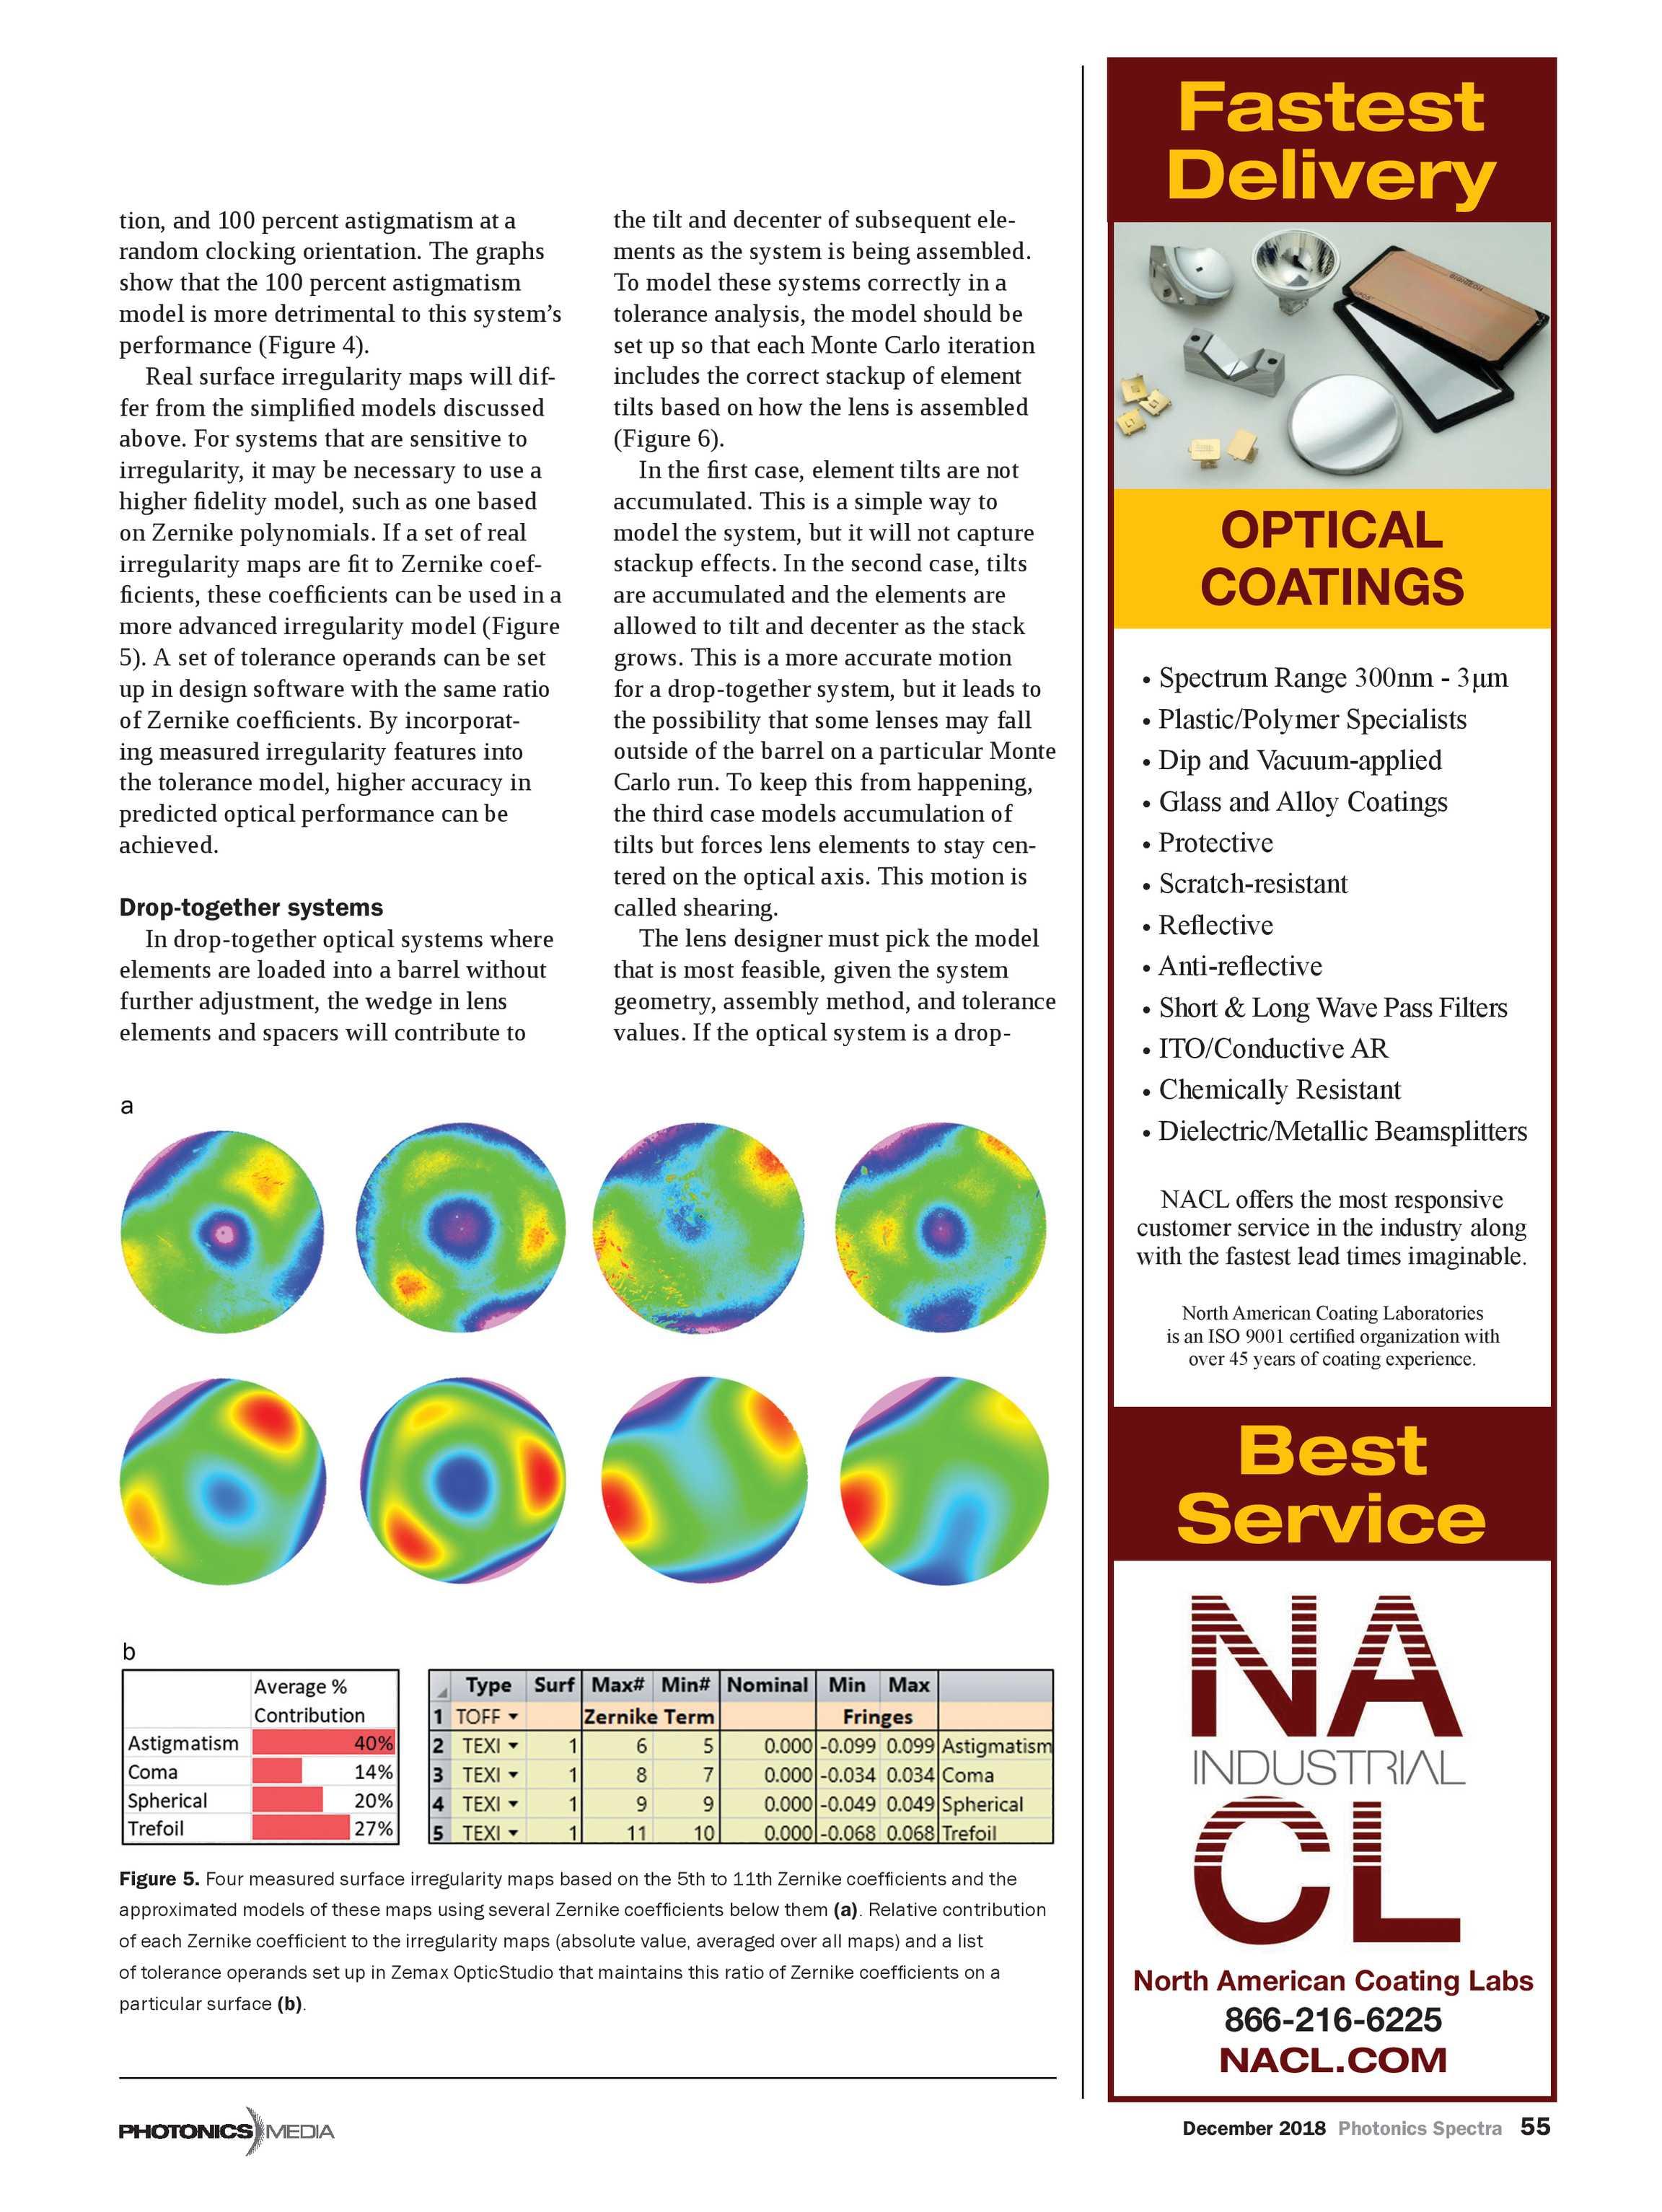 Photonics Spectra - December 2018 - page 55